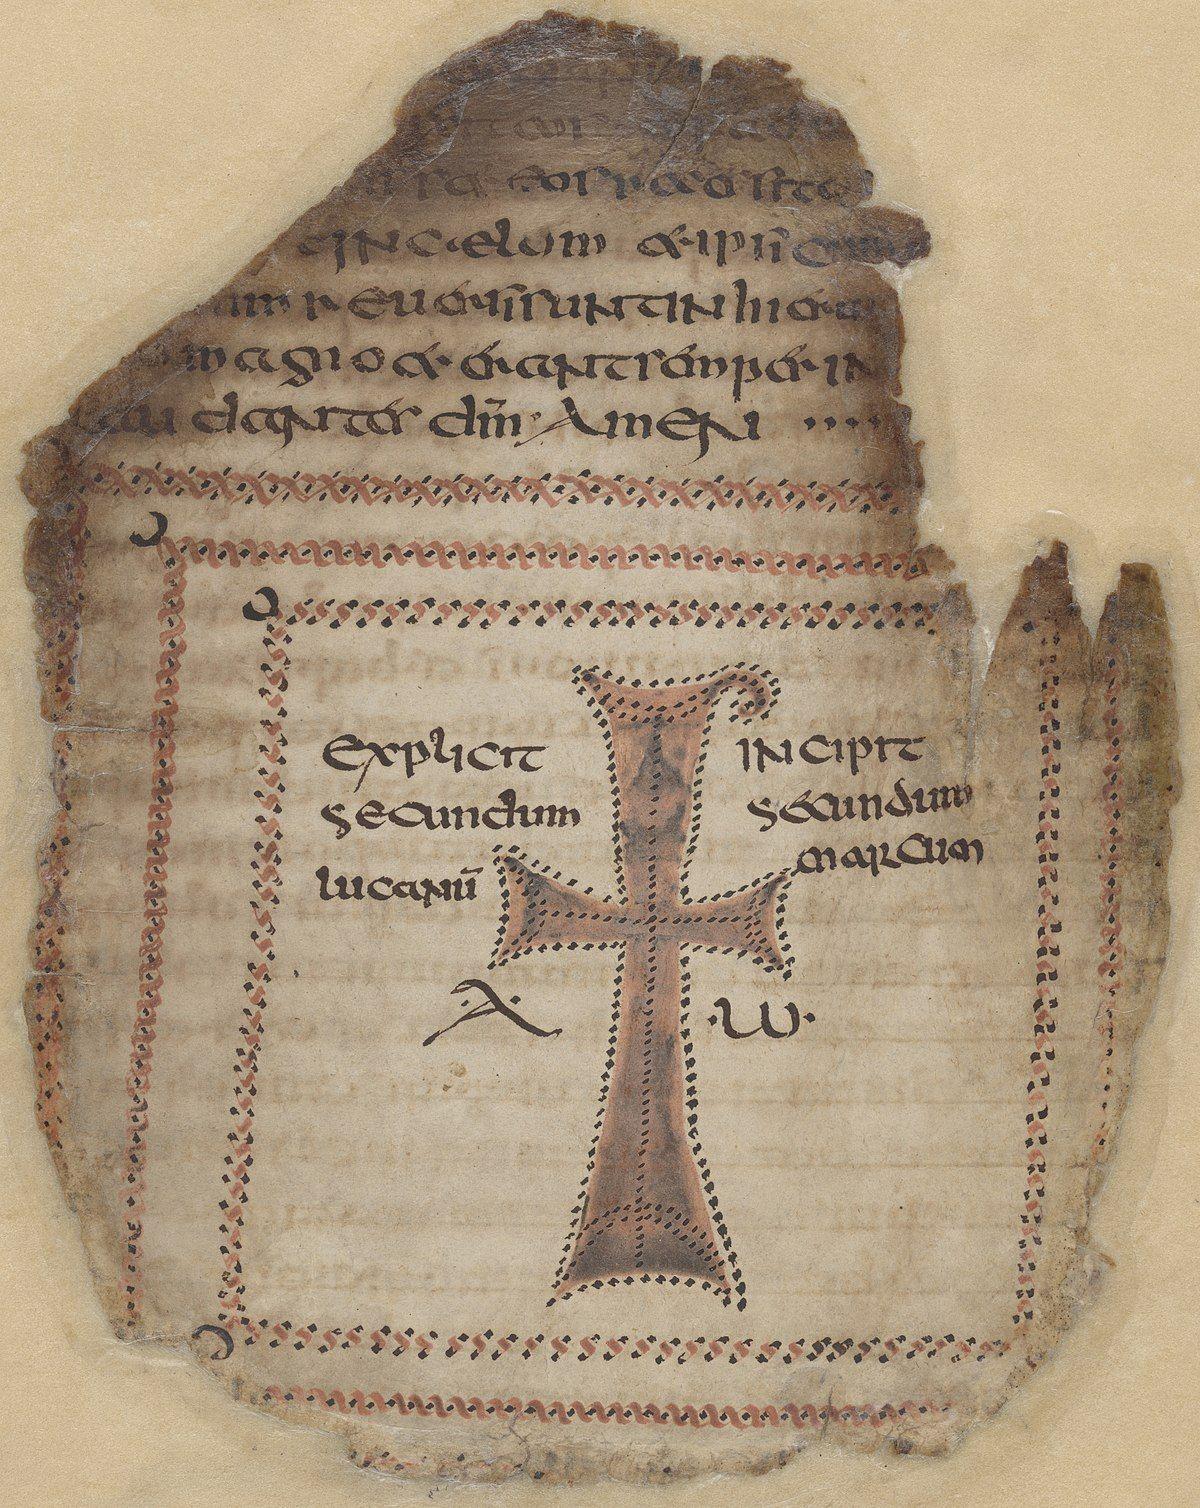 6/7th cent Irish gospel. Decoration is very similar to